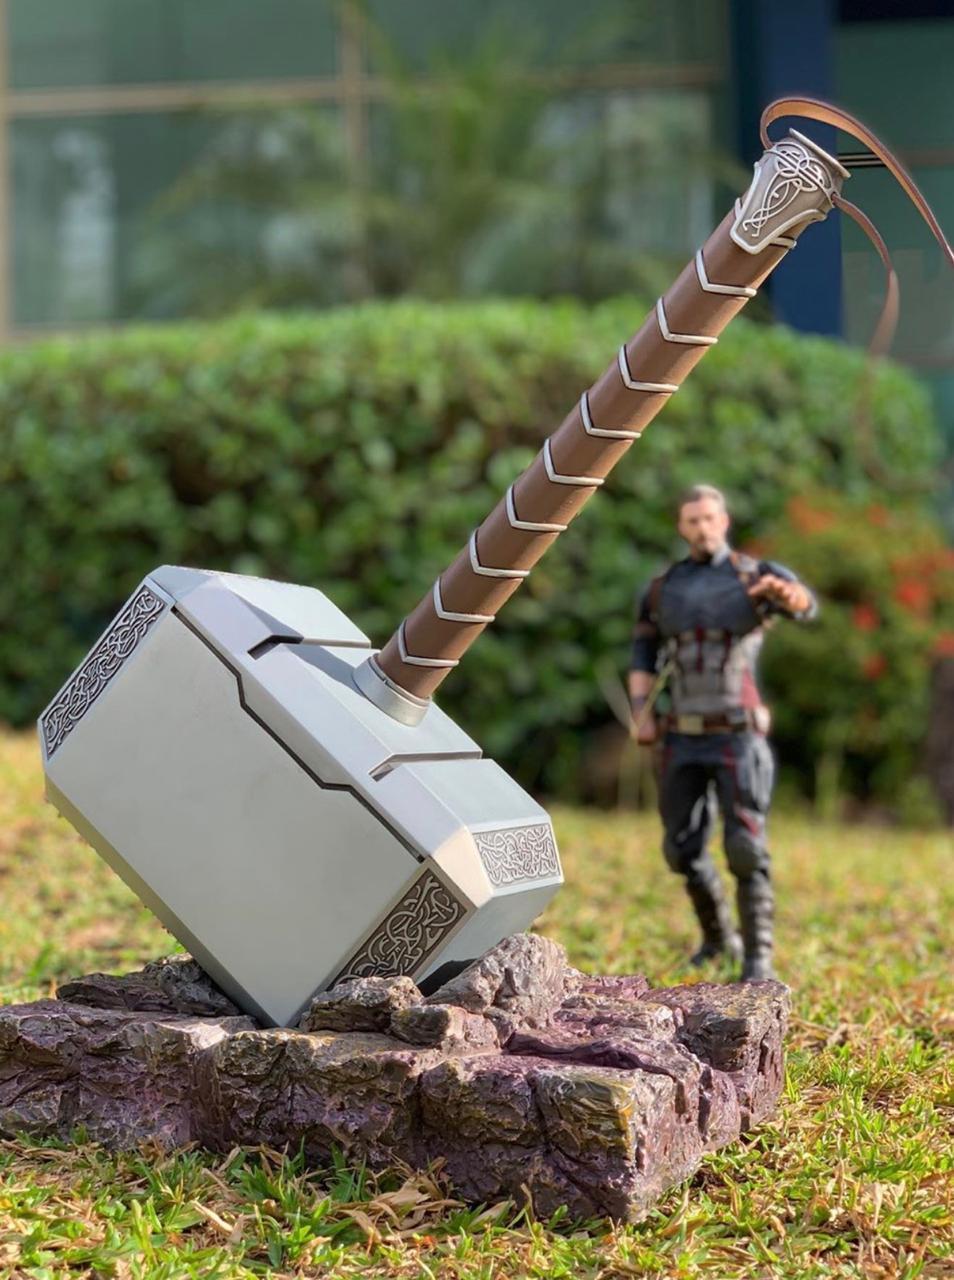 Réplica Martelo Thor (Mjolnir): Os Vingadores (The Avengers) Escala 1/1 (Com Base)